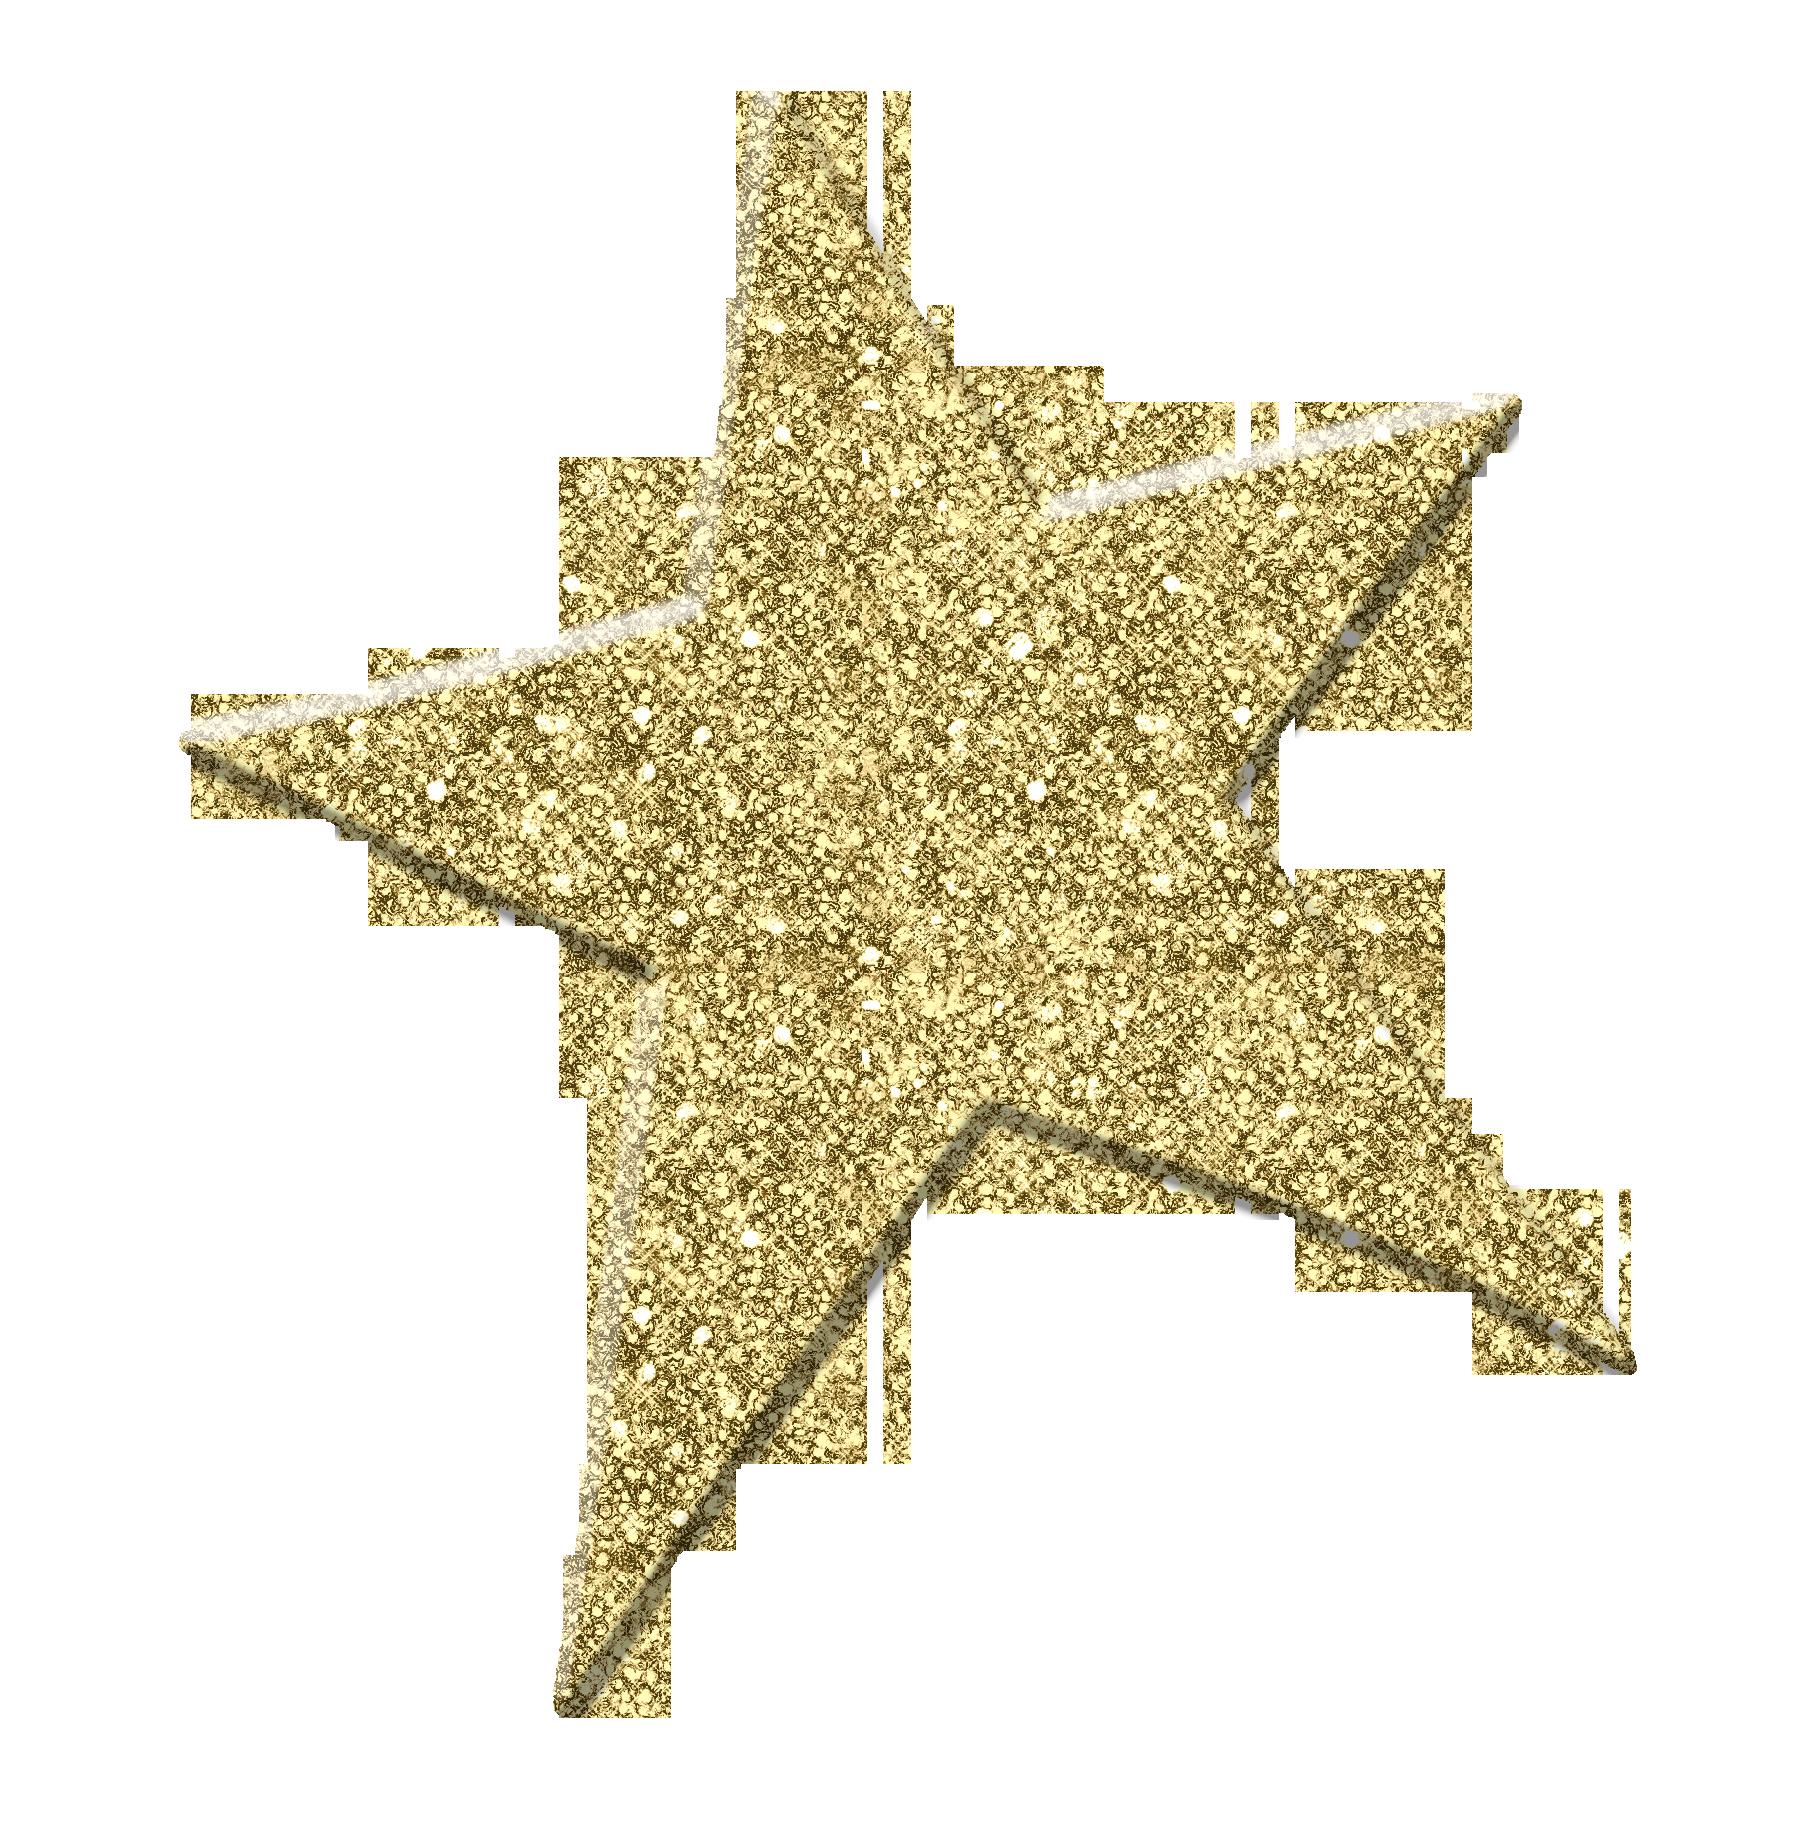 Free star cliparts download. Sunglasses clipart glitter